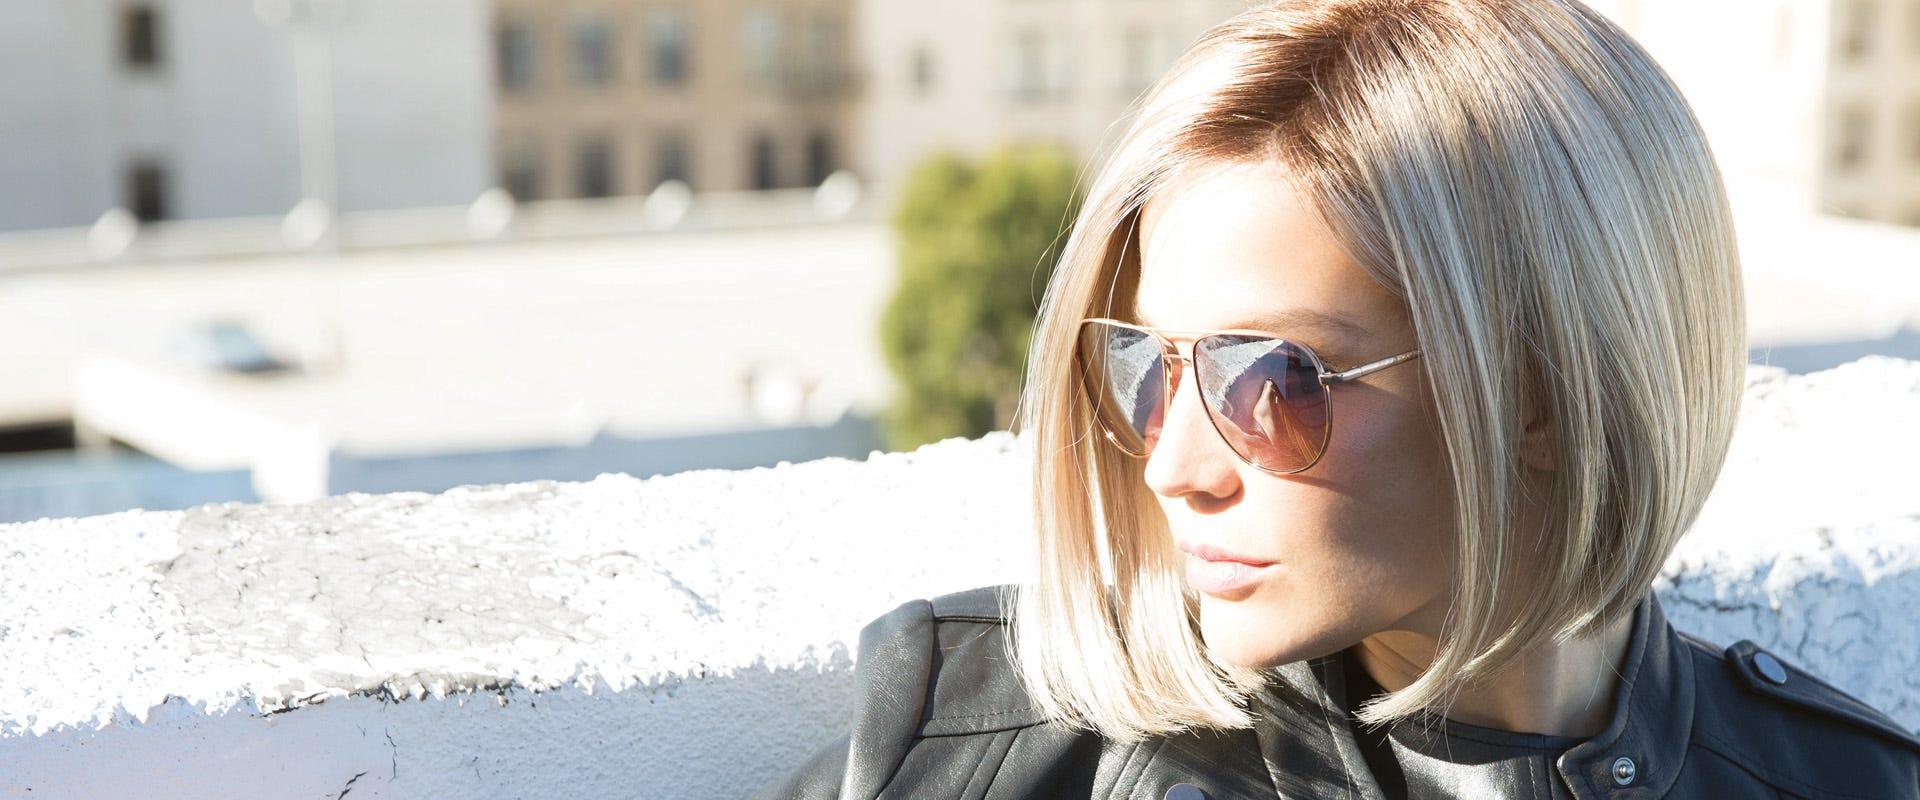 2018 February Rene of Paris Hi Fashion Winter Collection